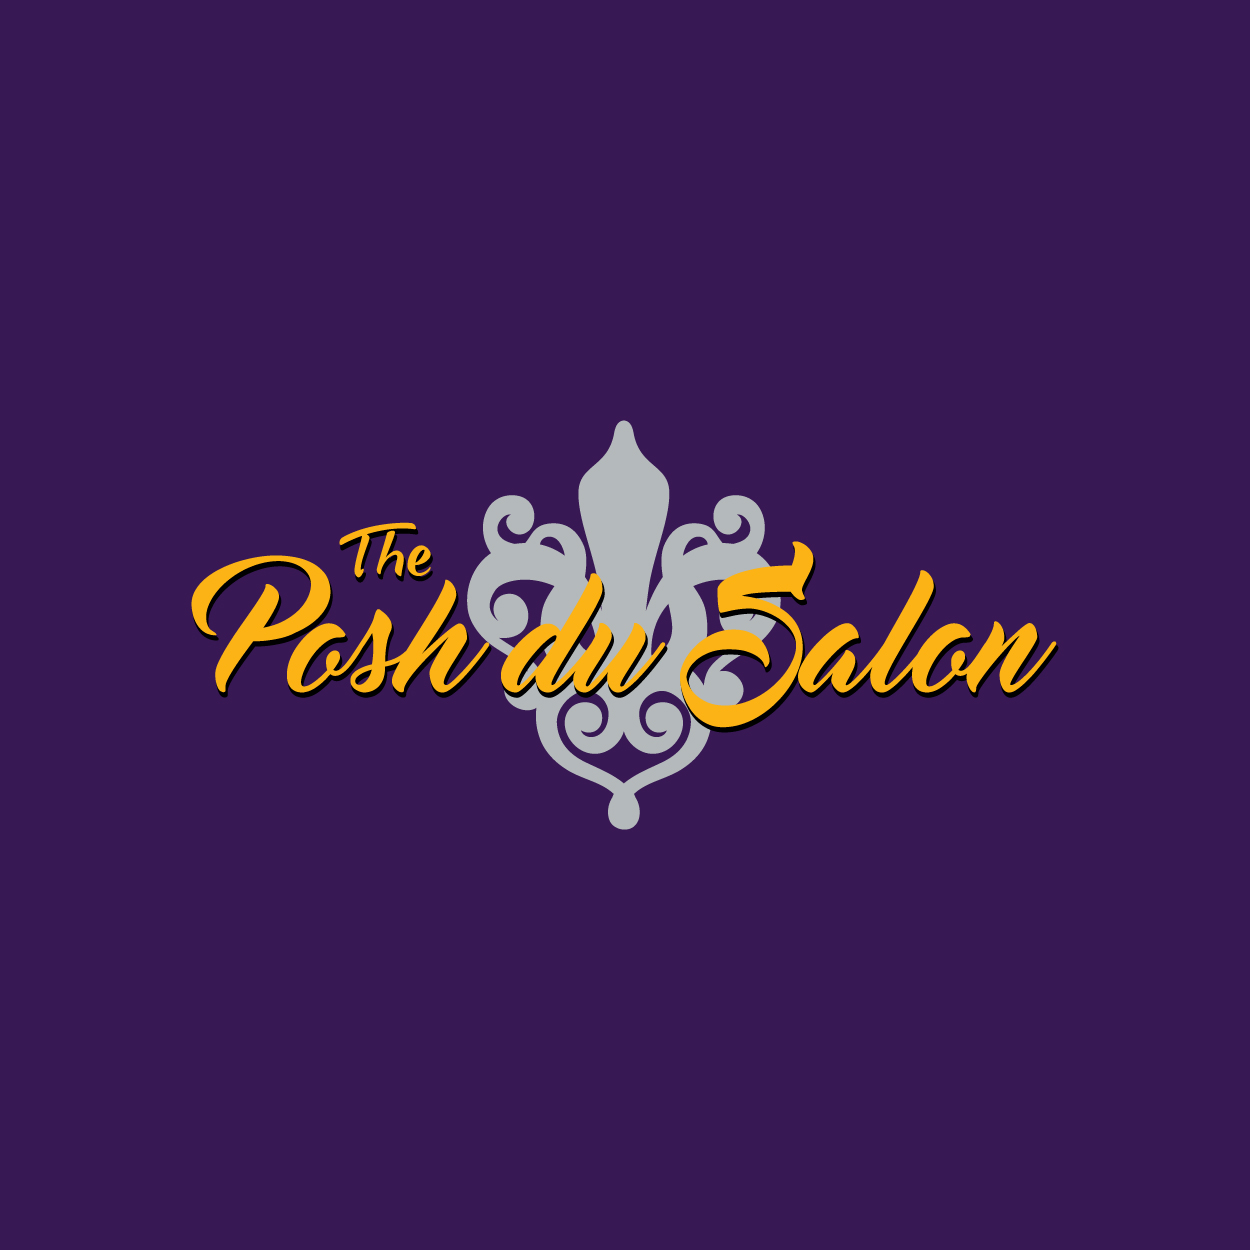 PoshduSalon Logo